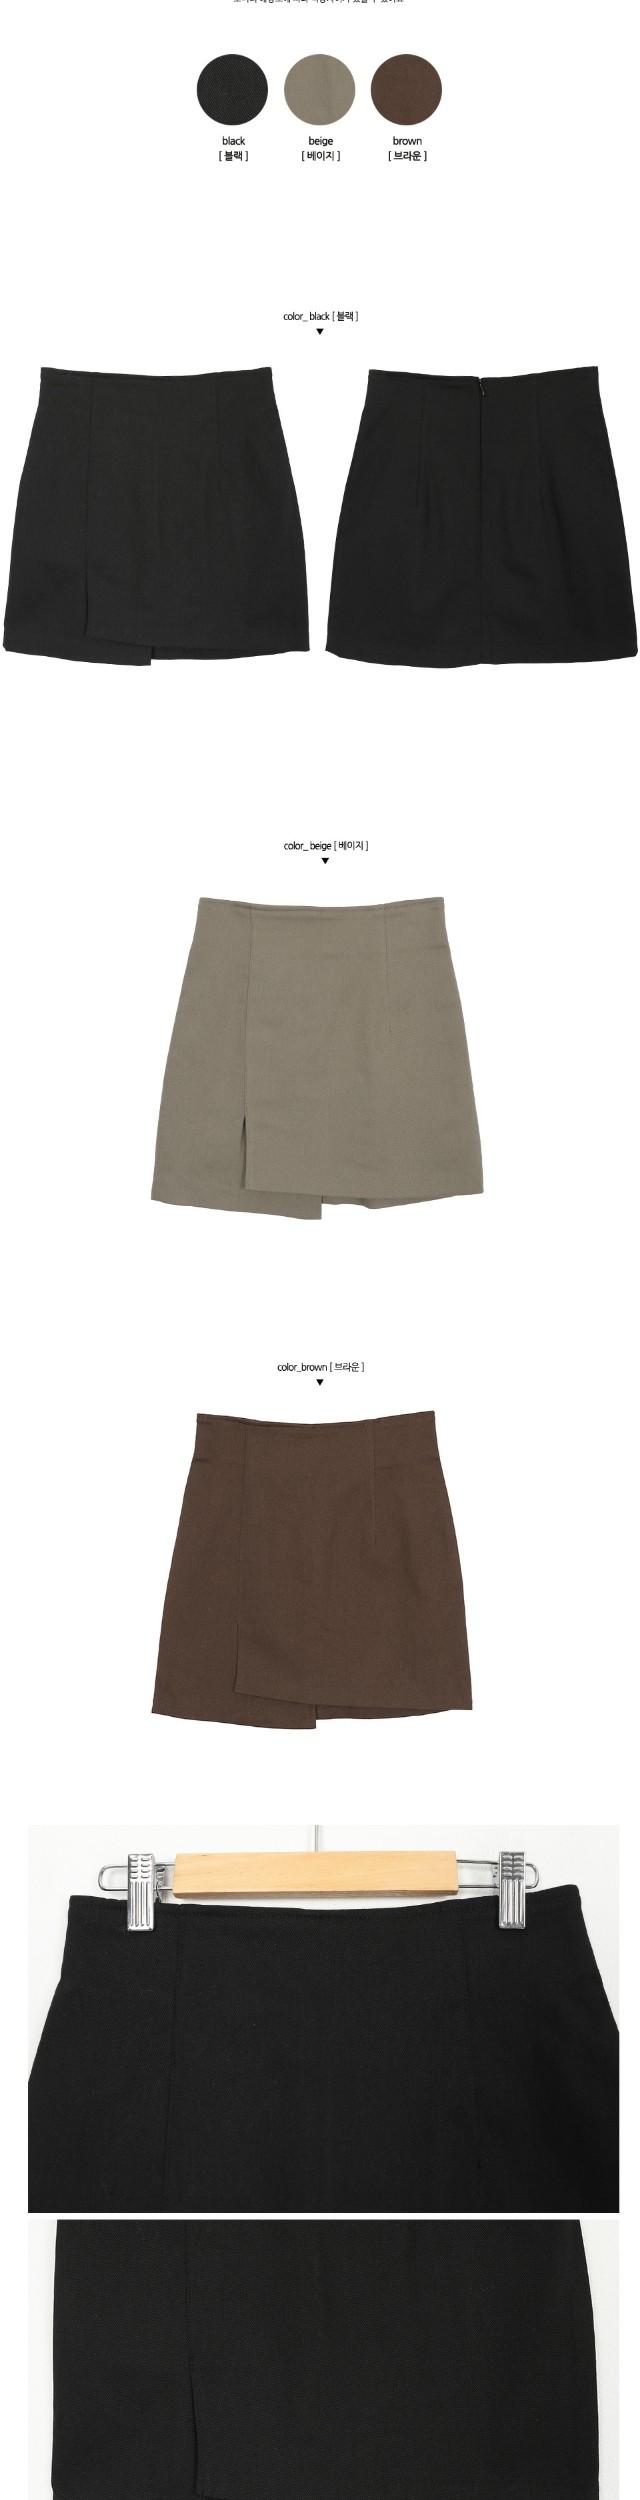 Cocoa Mini High Skirt